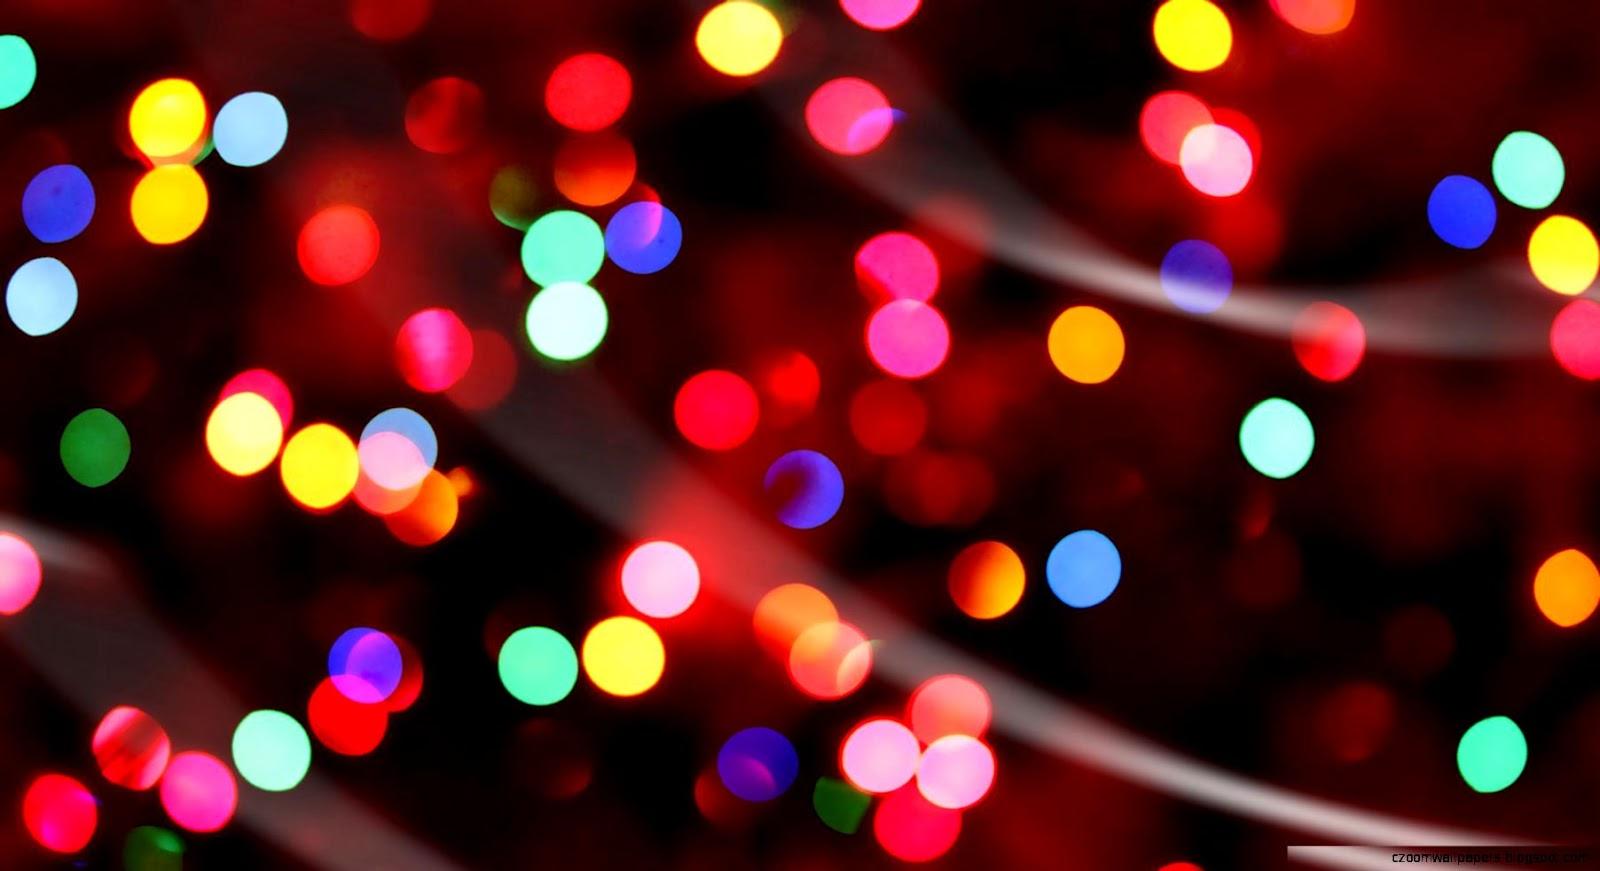 Celebration Background Hd: Christmas Background Wallpaper Hd